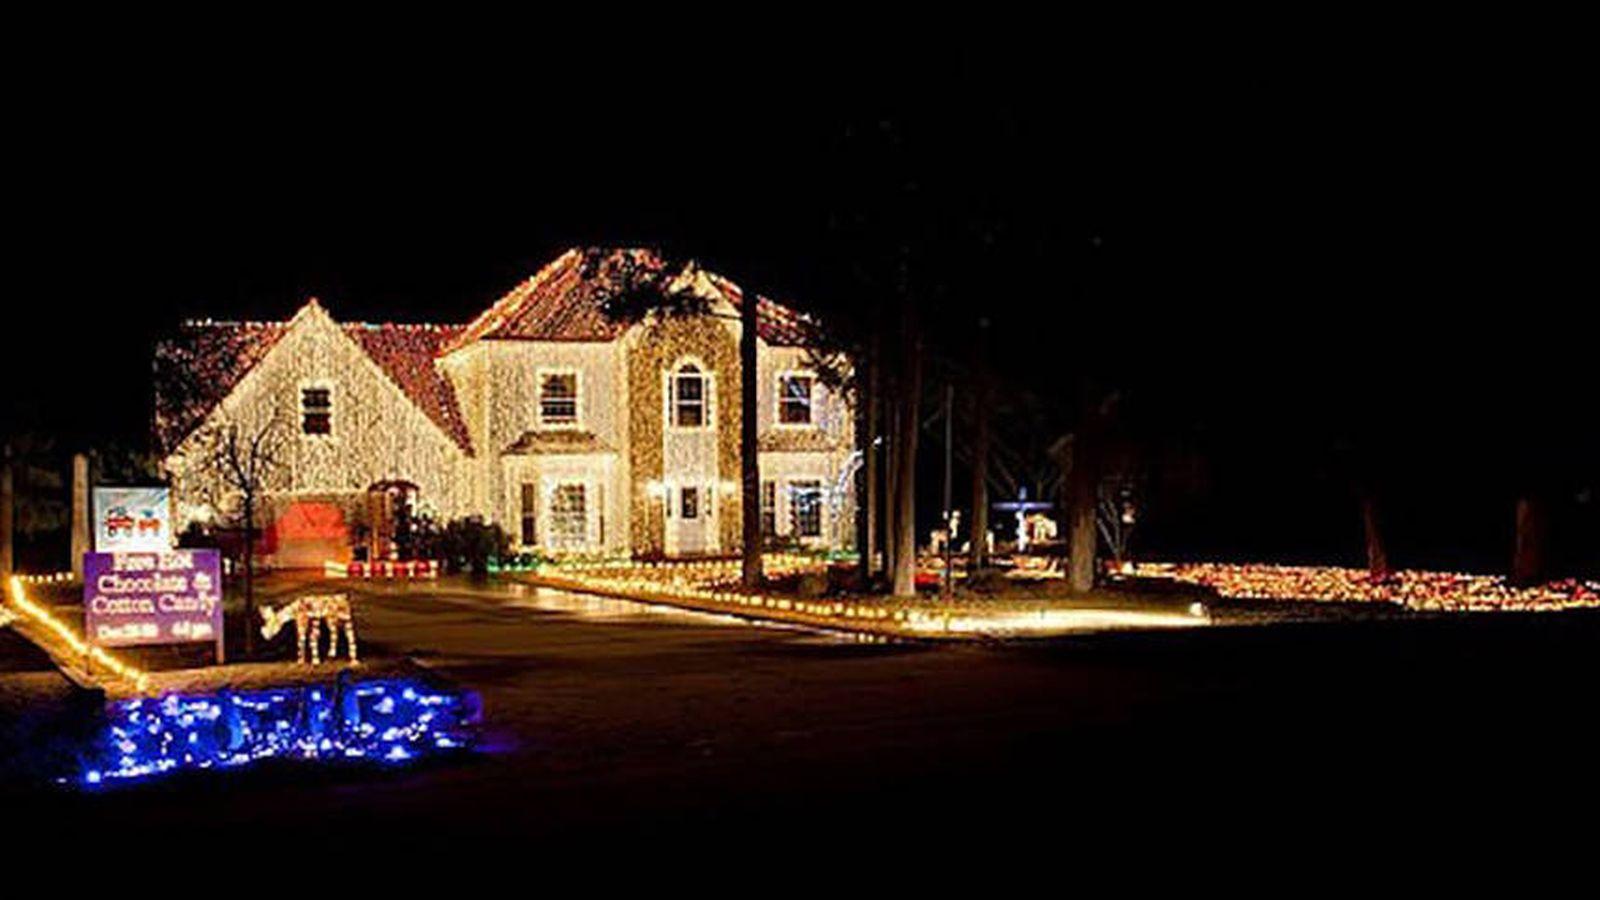 Foto: La espectacular casa de los Morris. (Foto: Mark Addy)